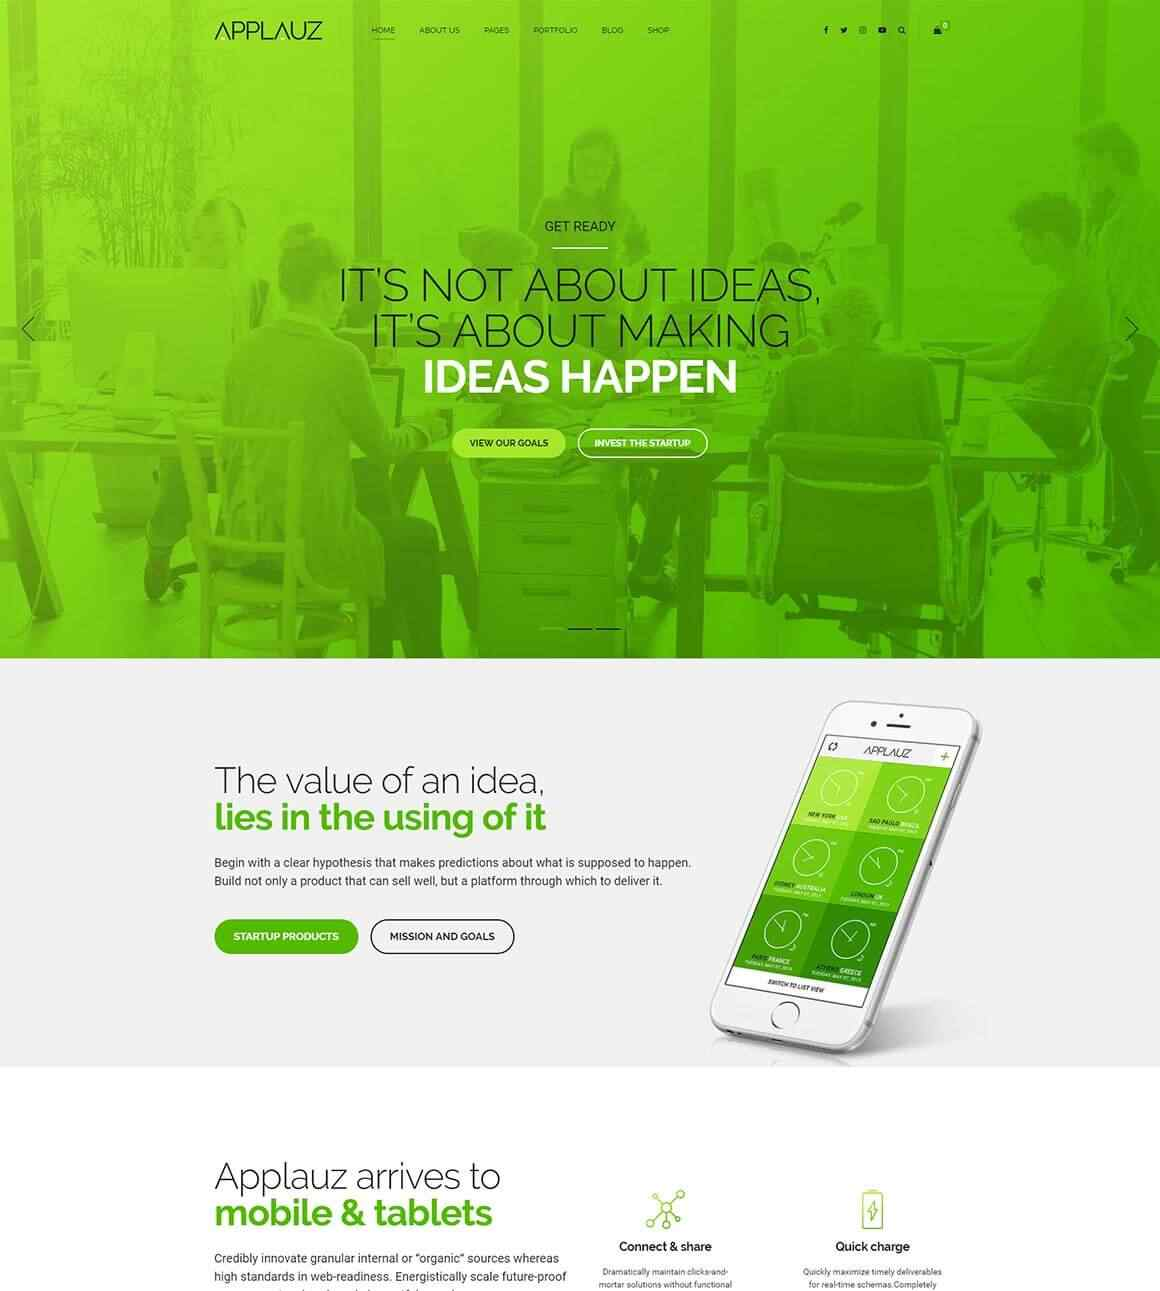 https://evidencijaradnogvremena.com/wp-content/uploads/2017/11/Screenshot-Startup.jpg